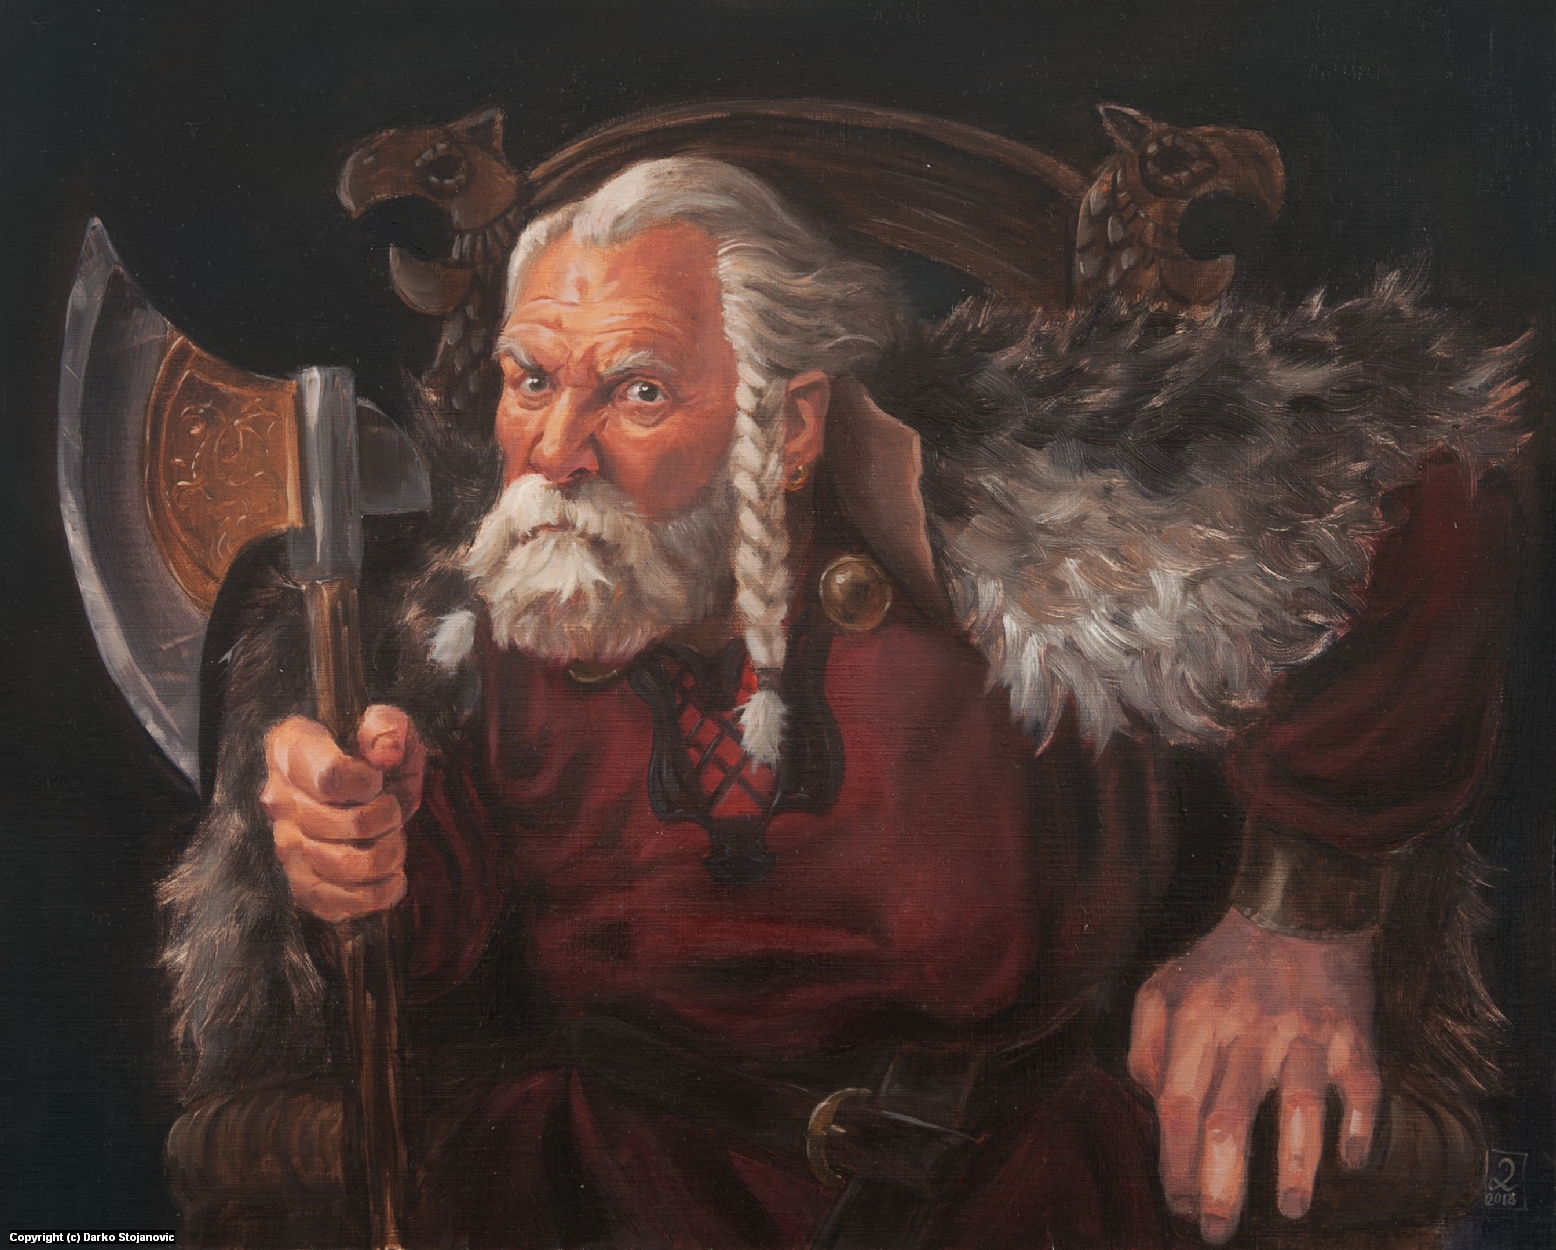 Old warlord Artwork by Darko Stojanovic